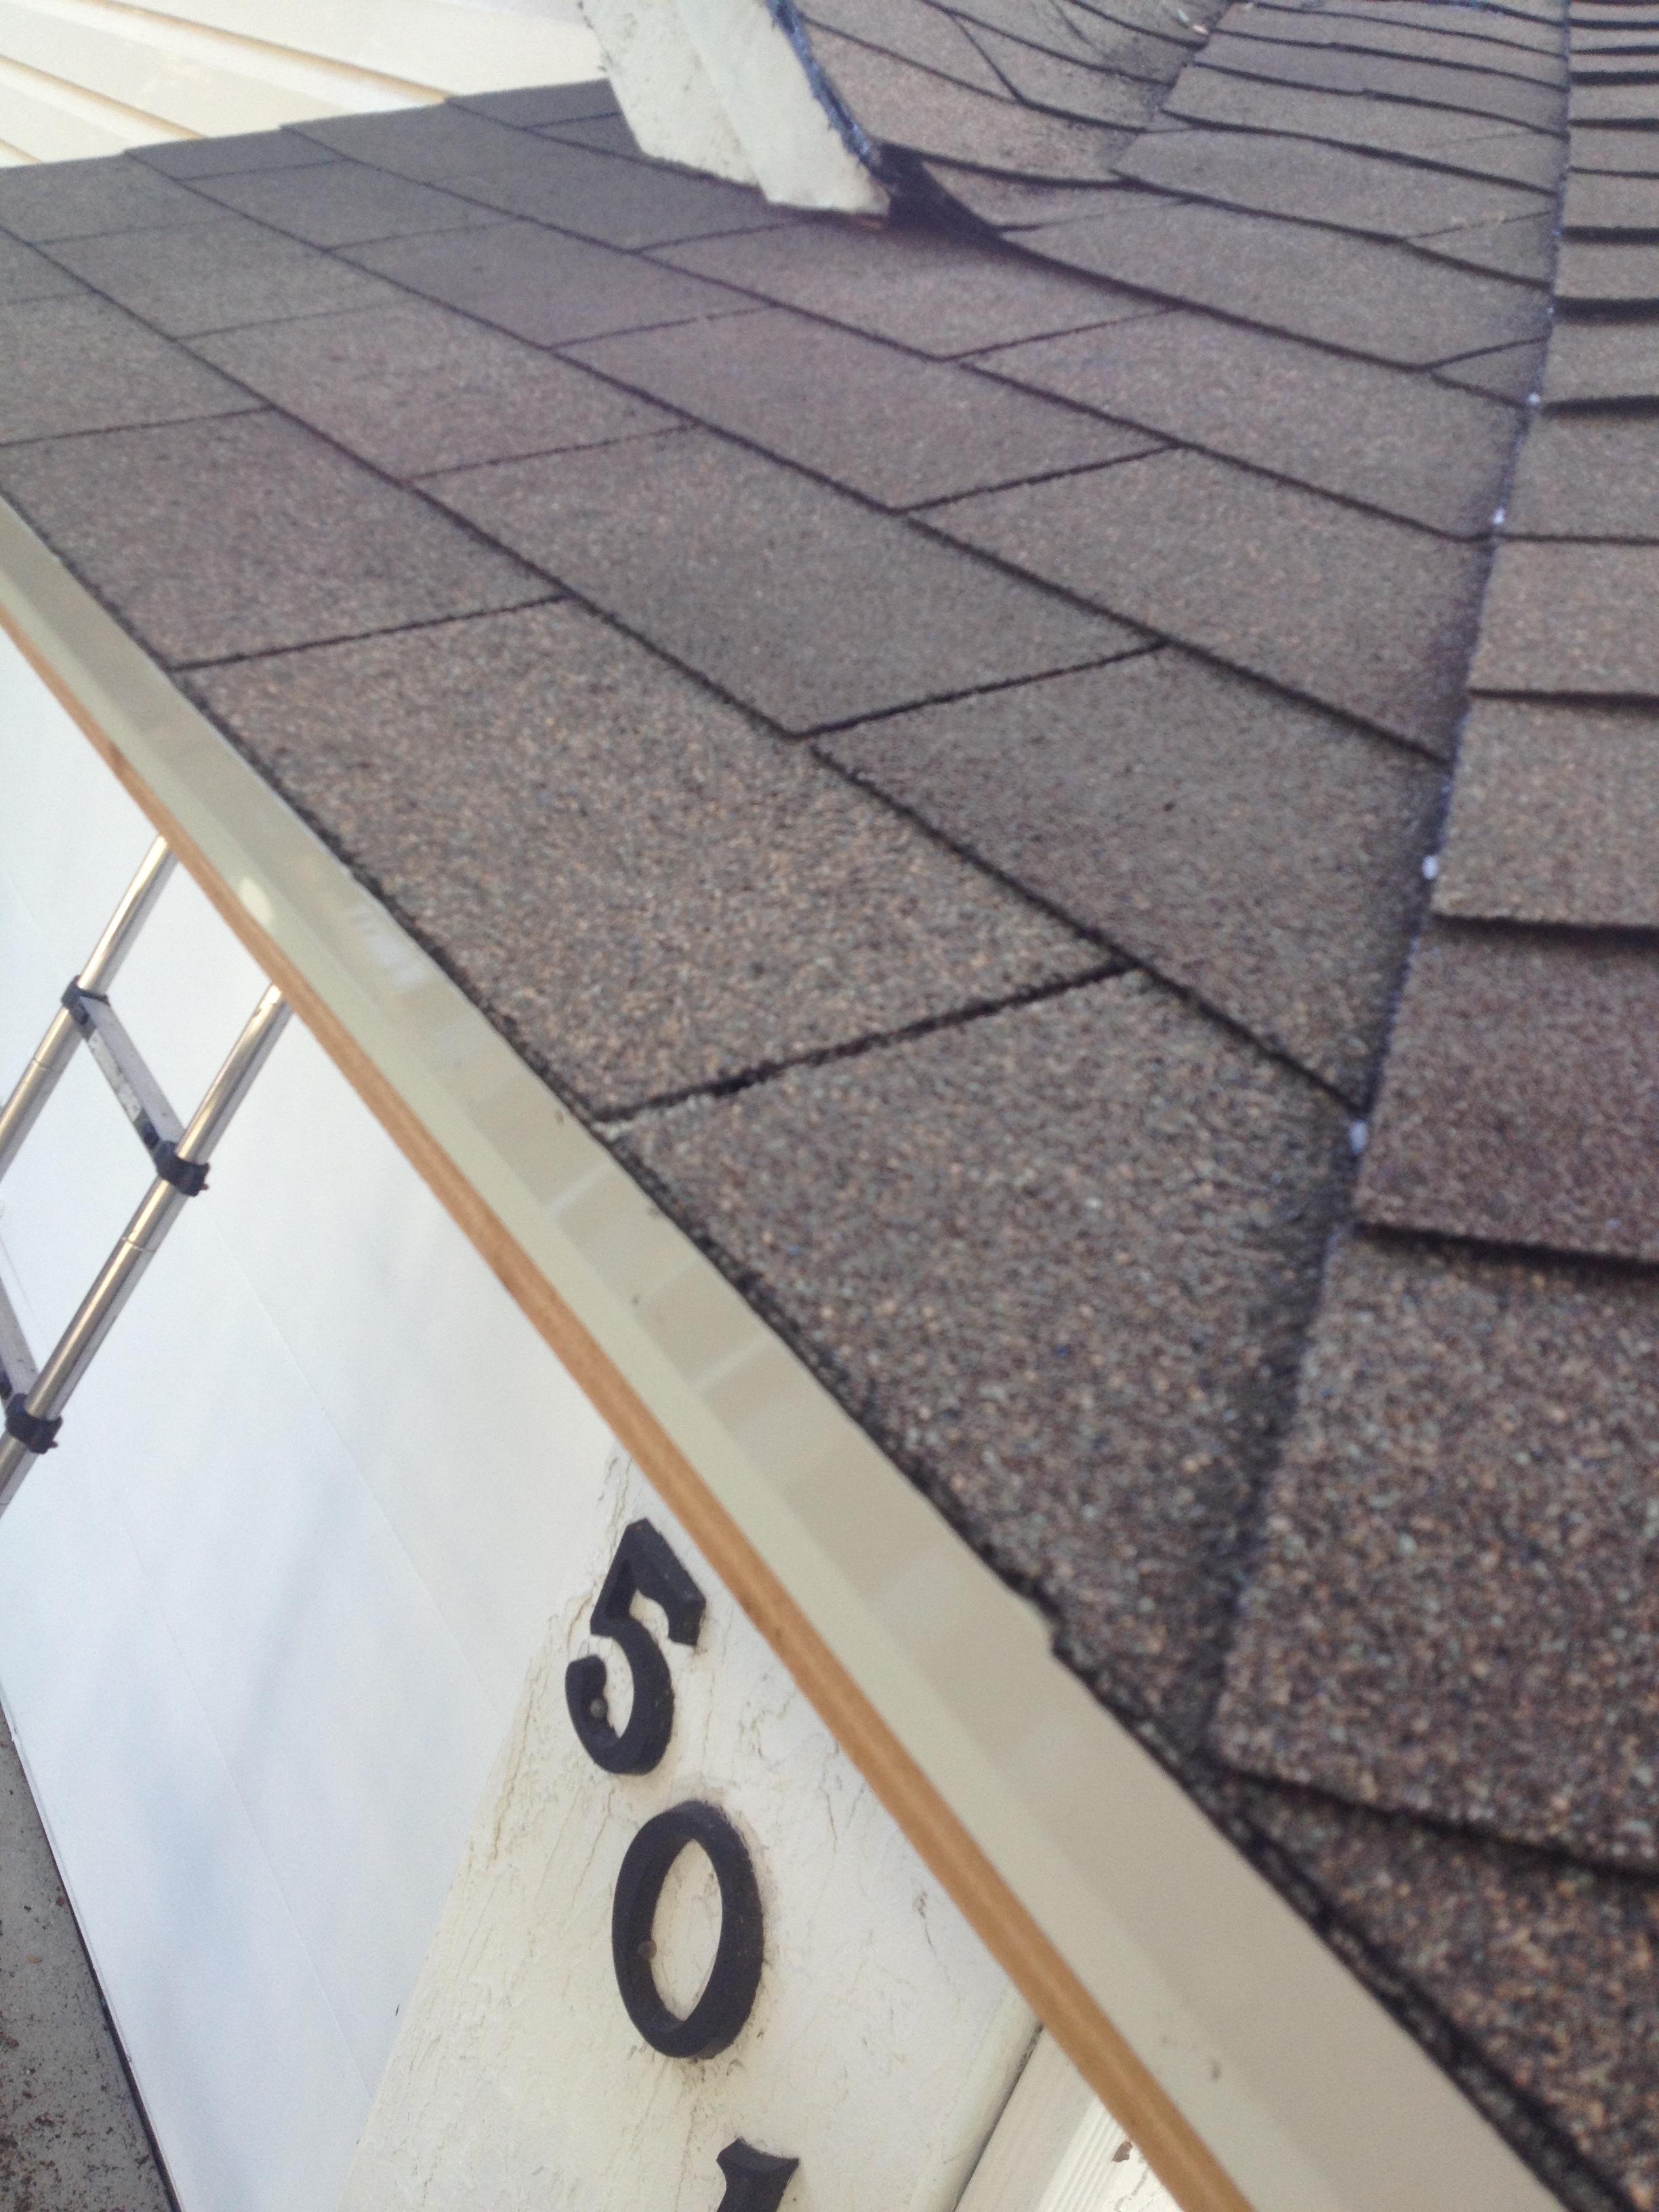 Roof Leak Repair Bcoxroofing Com